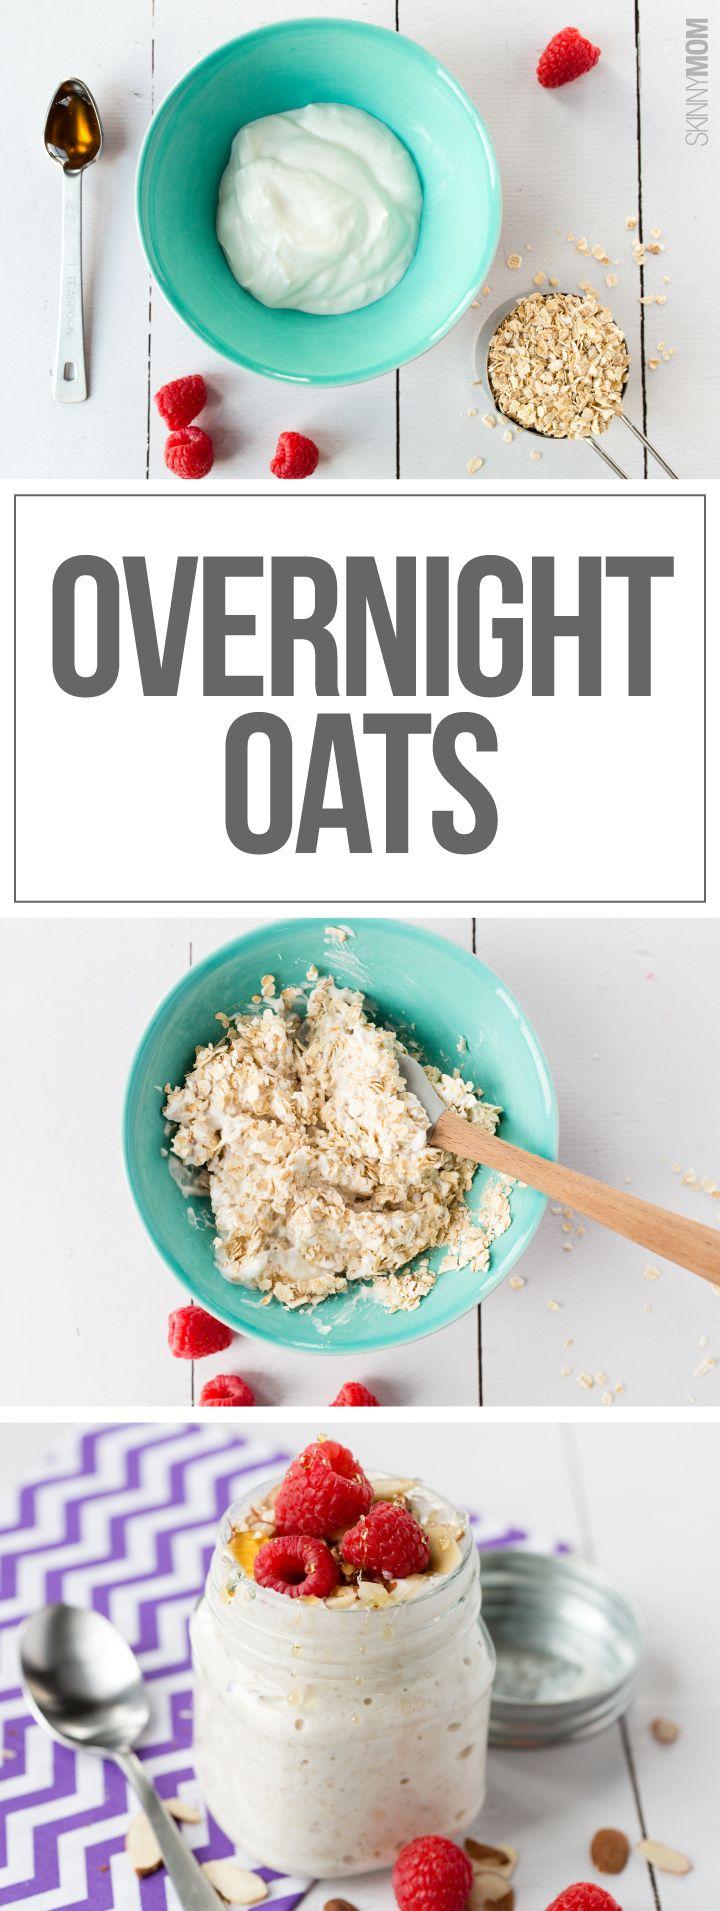 Recipe Fruitty Overnight Oats Healthy baking, Food